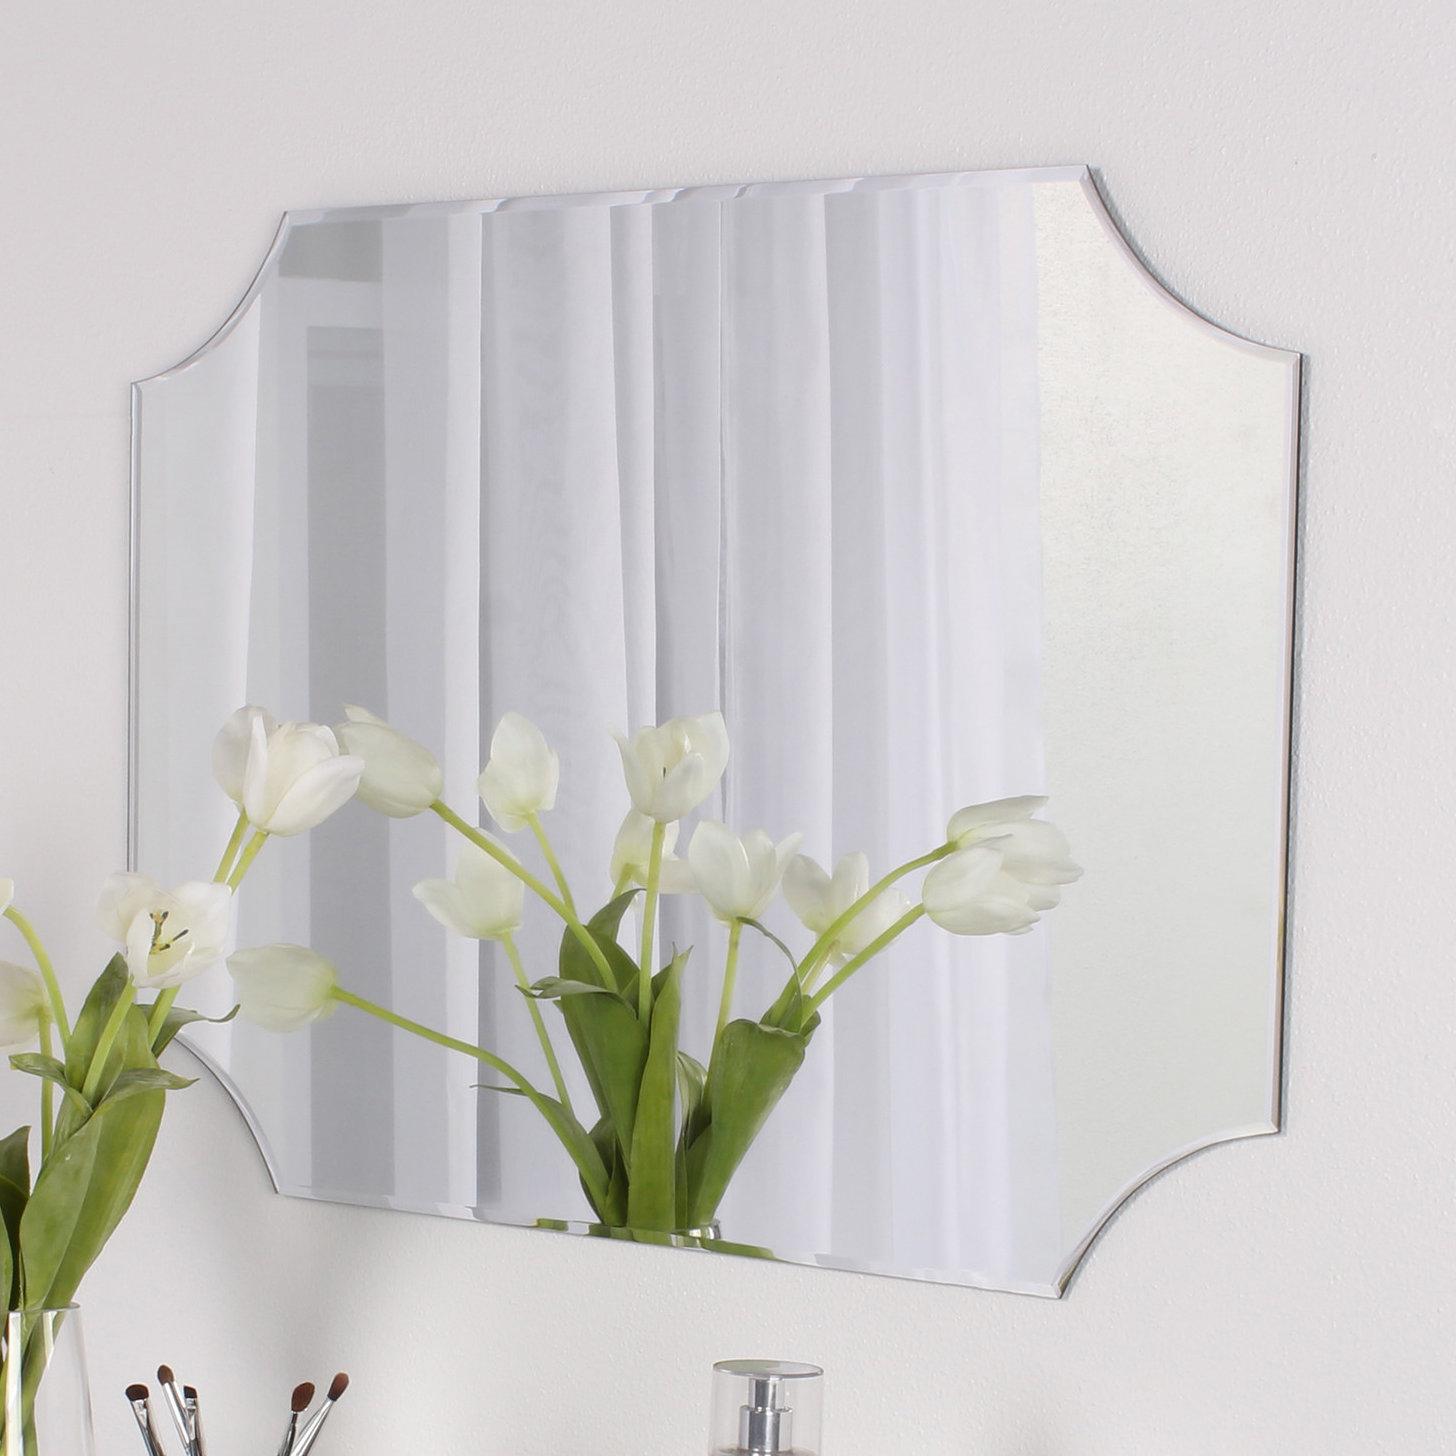 Trendy Lidya Frameless Beveled Wall Mirrors Intended For Reign Frameless Rectangle Scalloped Beveled Wall Mirror (View 7 of 20)